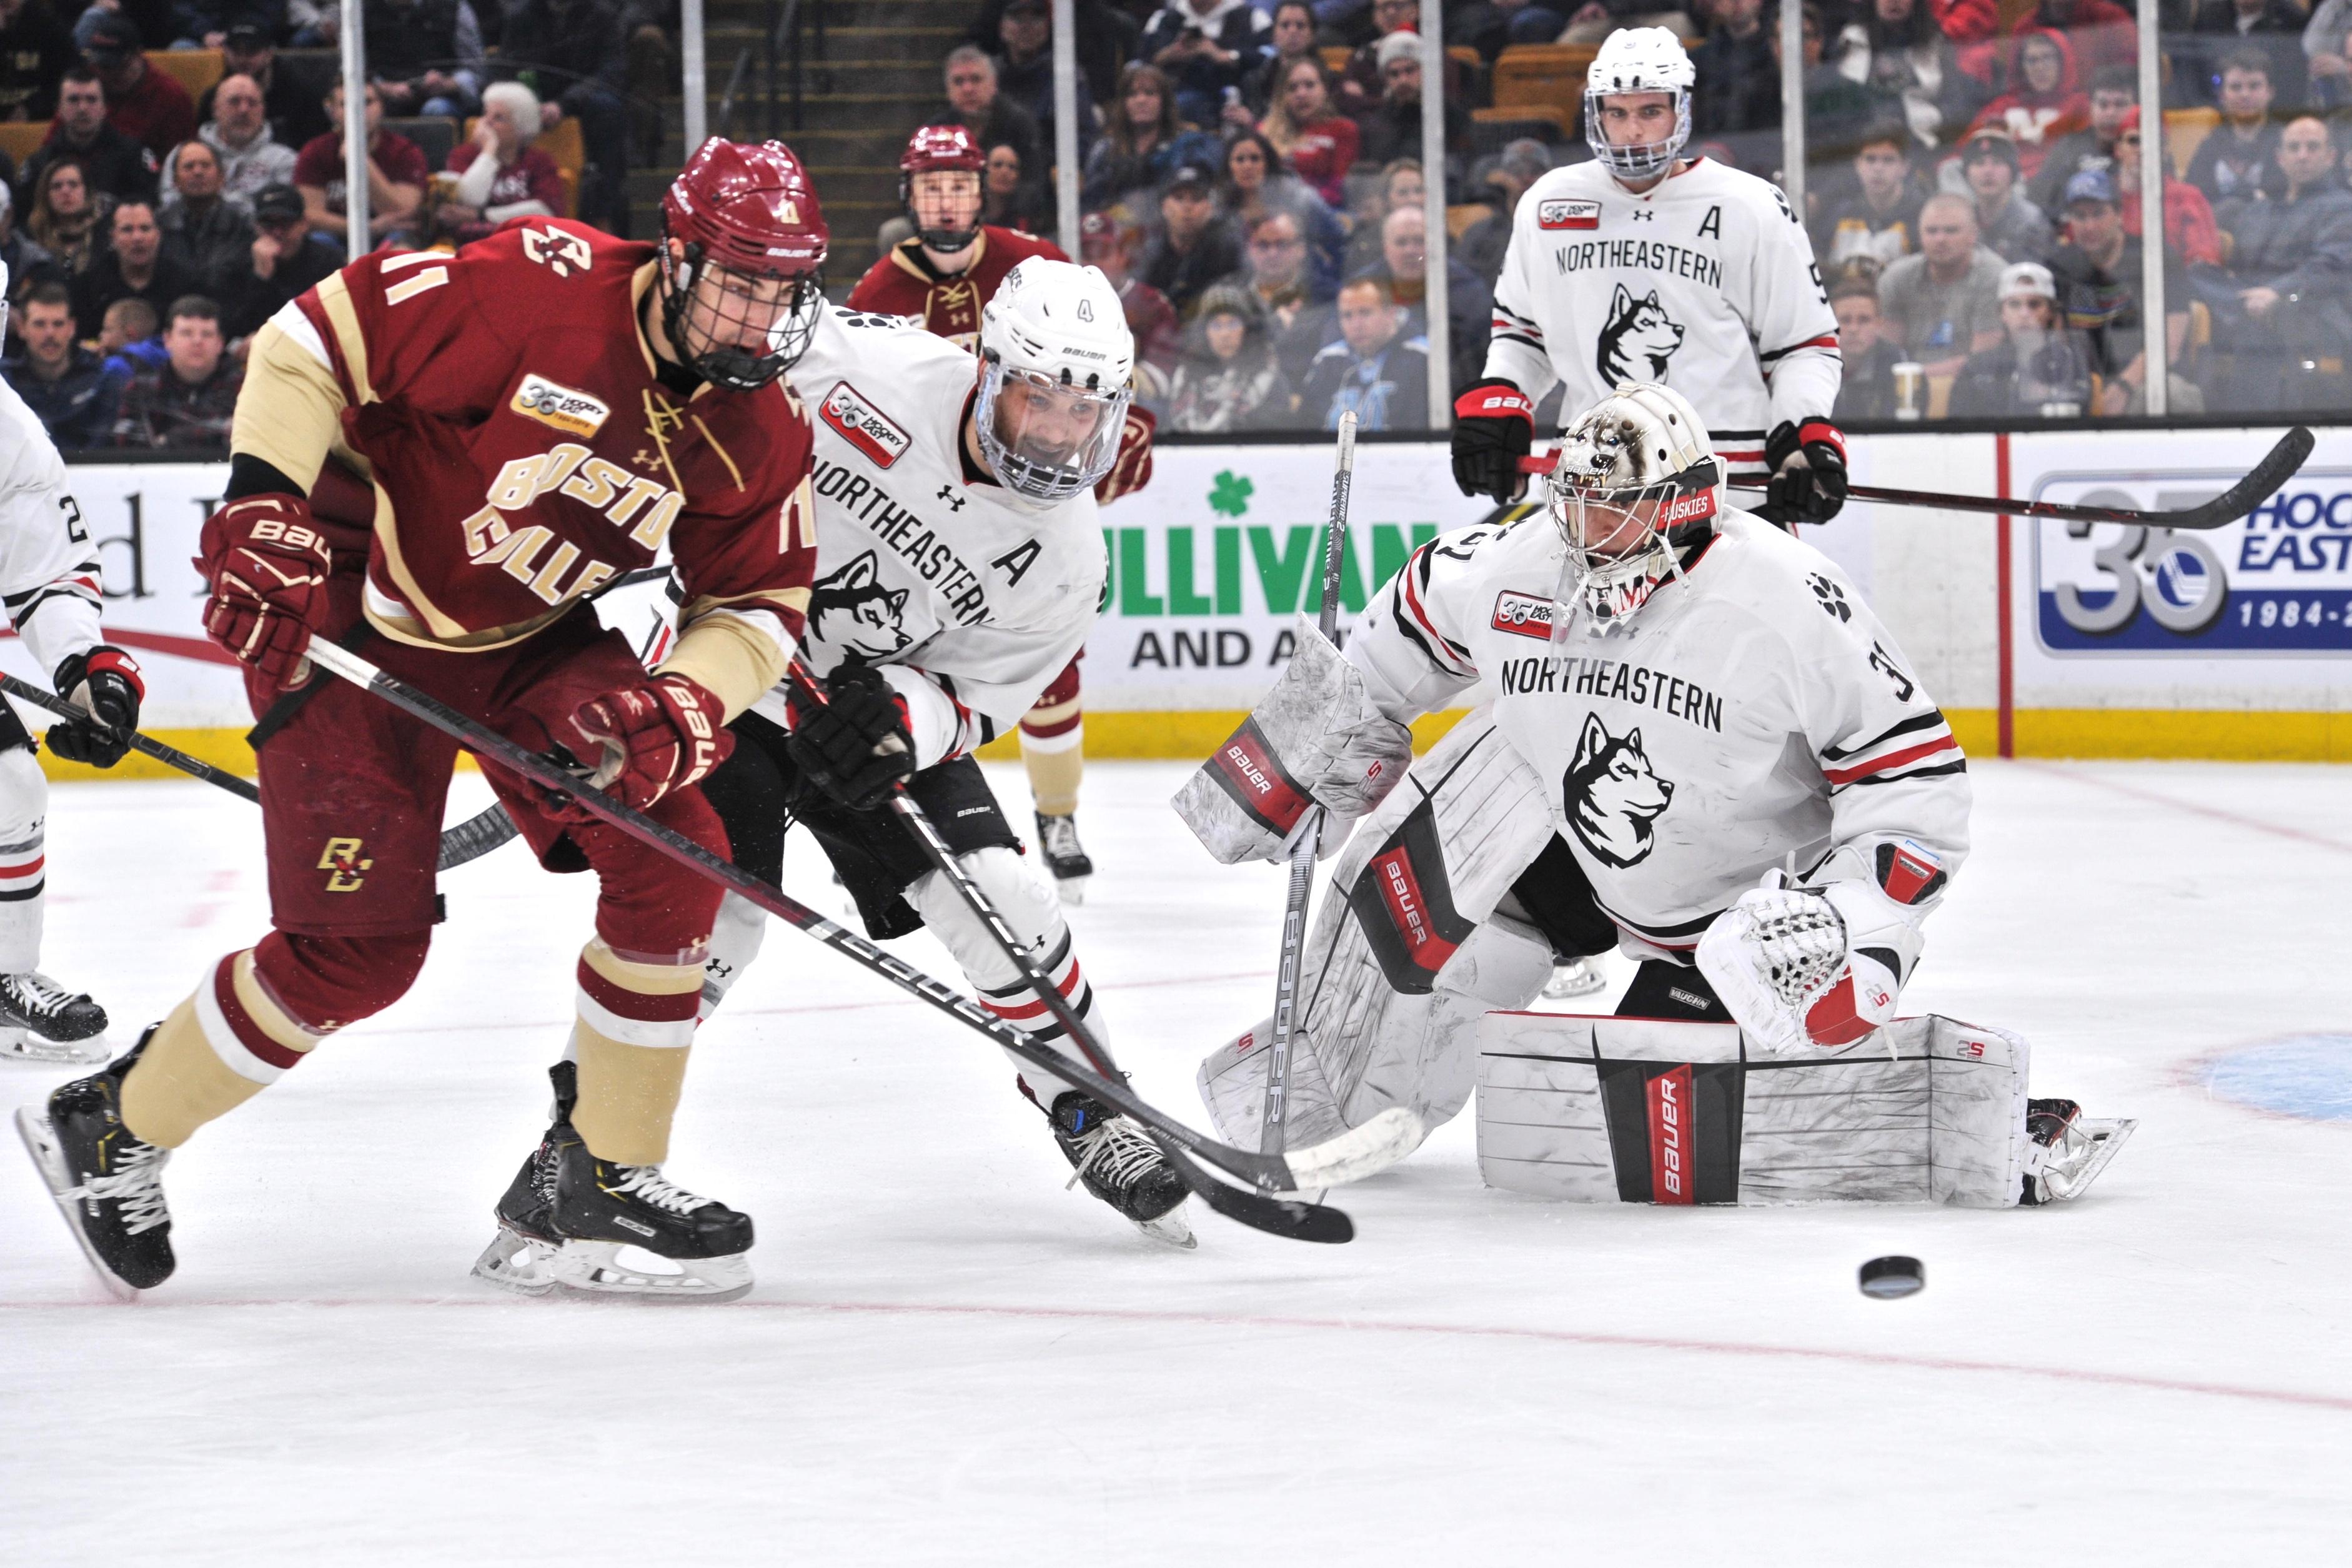 COLLEGE HOCKEY: MAR 23 Hockey East Championship - Boston College v Northeastern